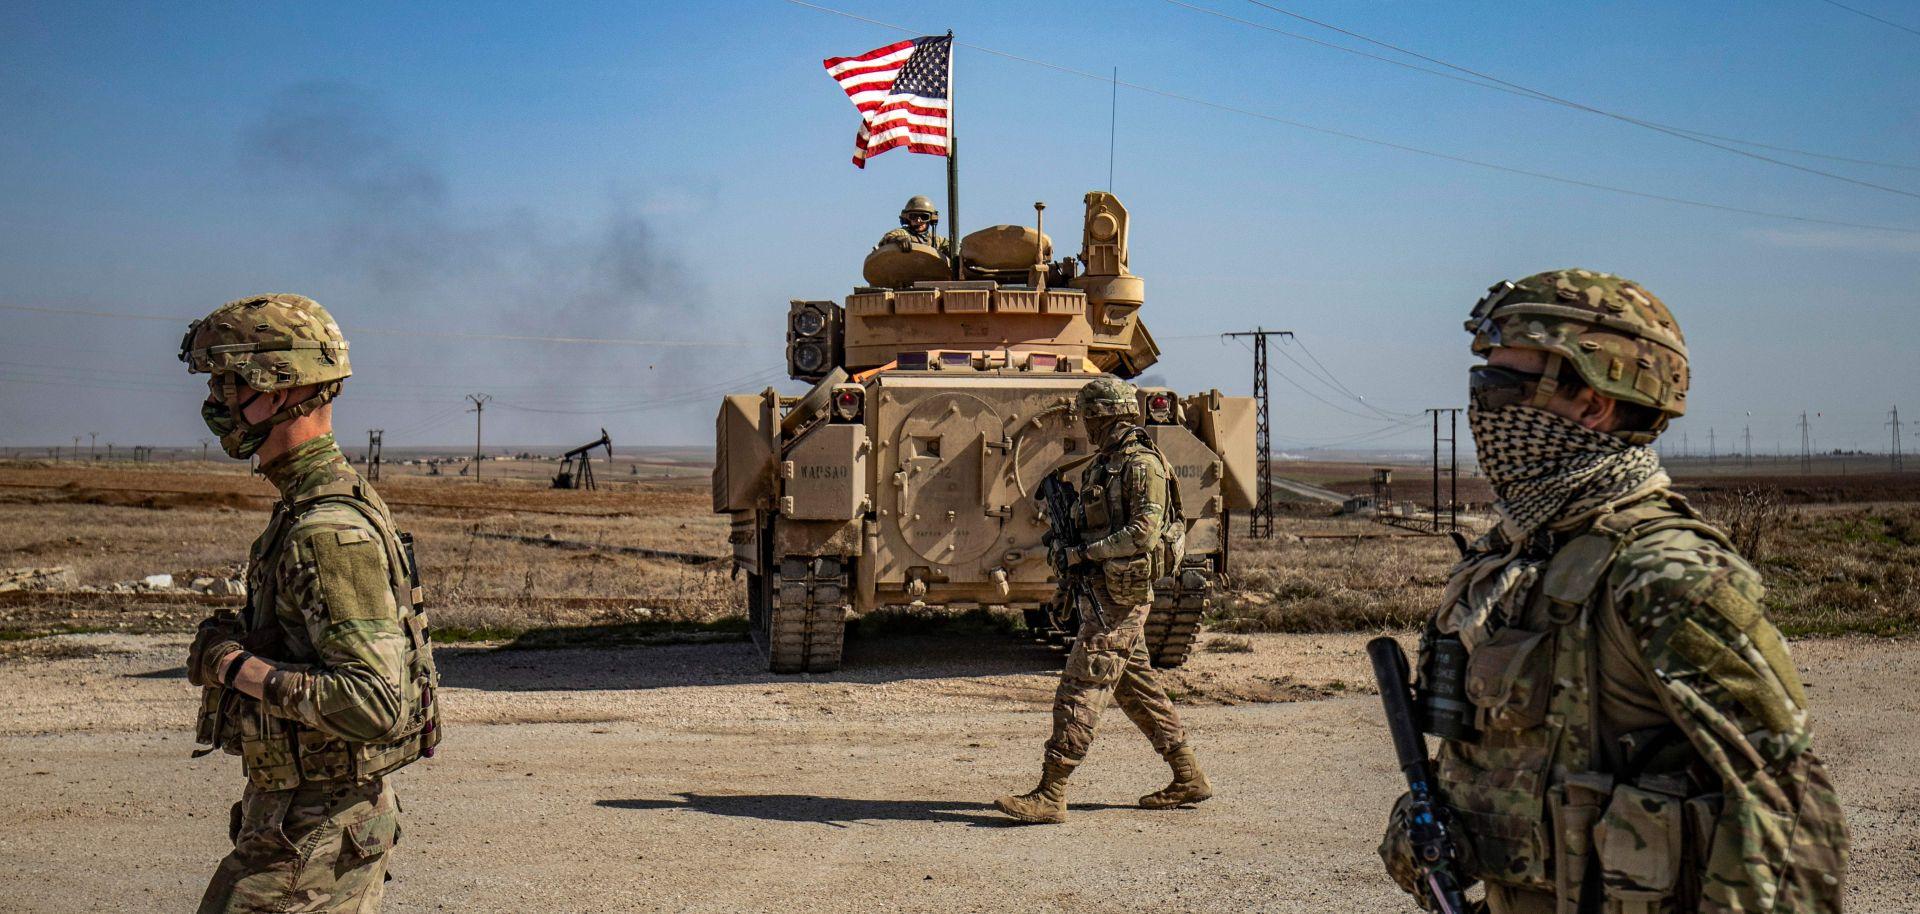 U.S. soldiers patrol oil fields in northeast Syria on Feb. 13, 2021.